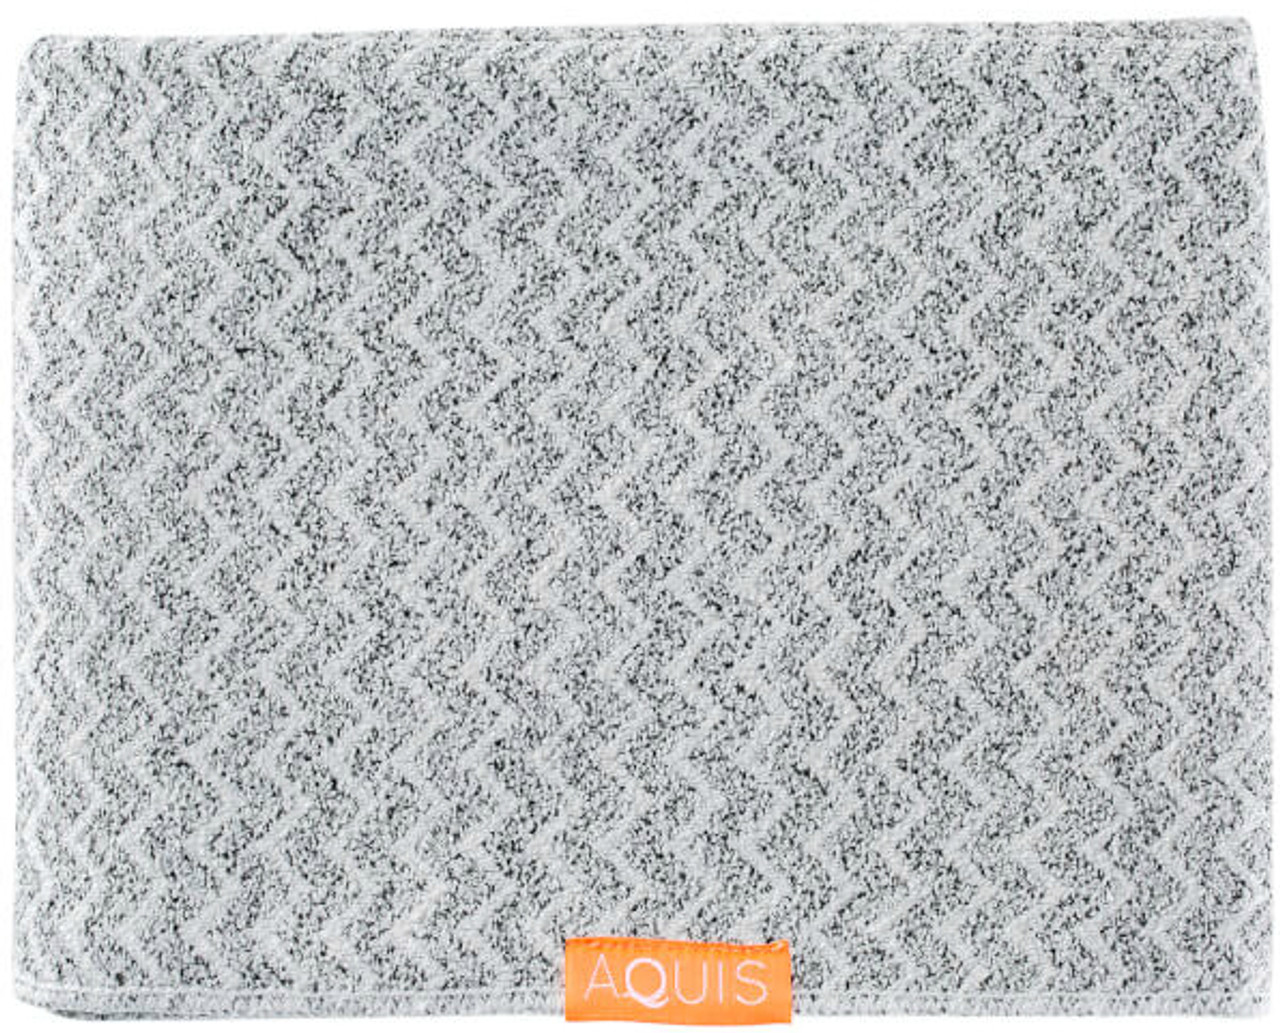 Aquis Lisse Luxe Long Hair Towel, Chevron